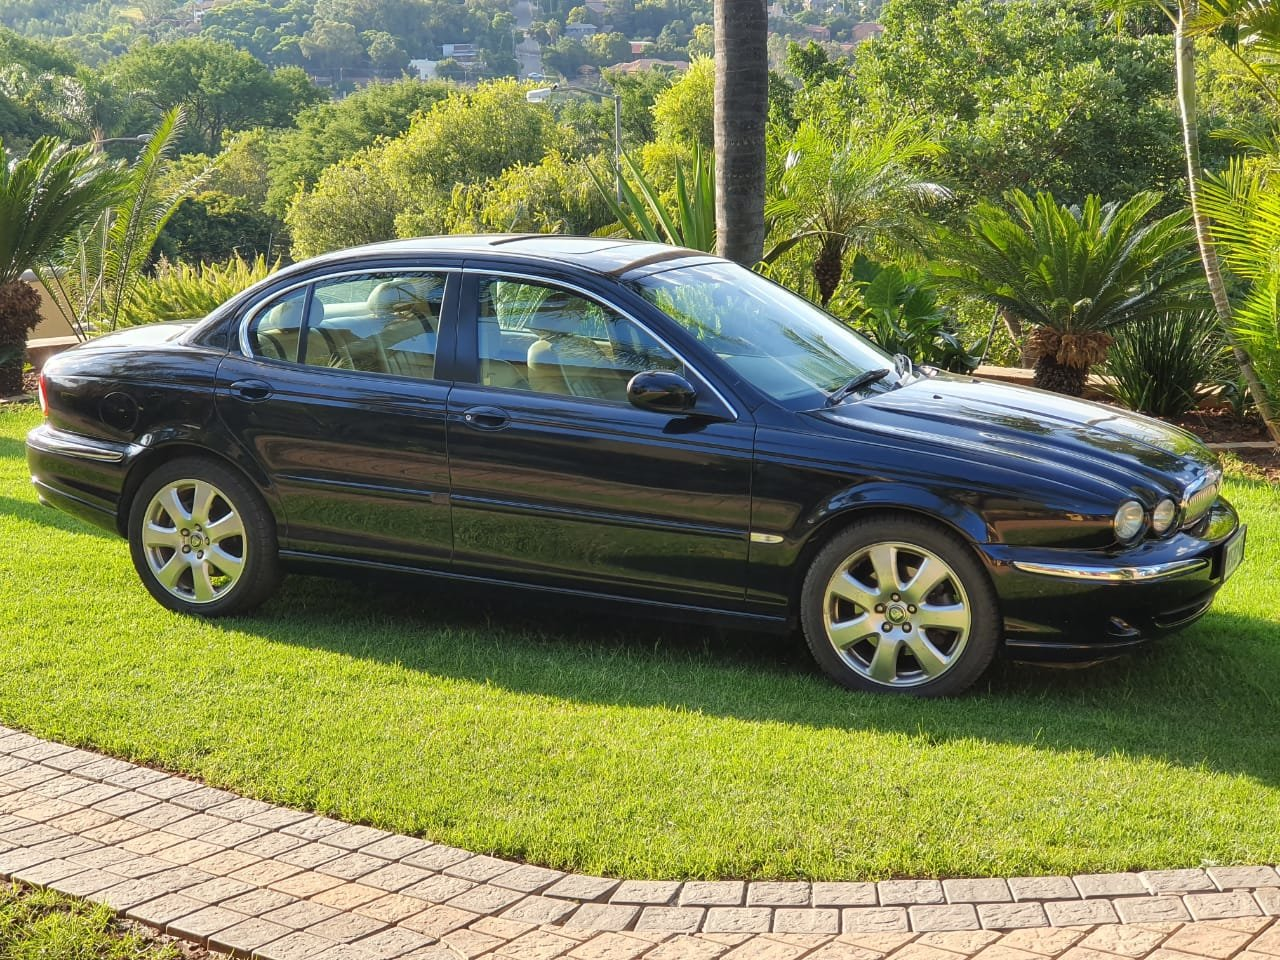 2006 Jaguar X Type Diesel 2.2  For Sale (picture 2 of 6)